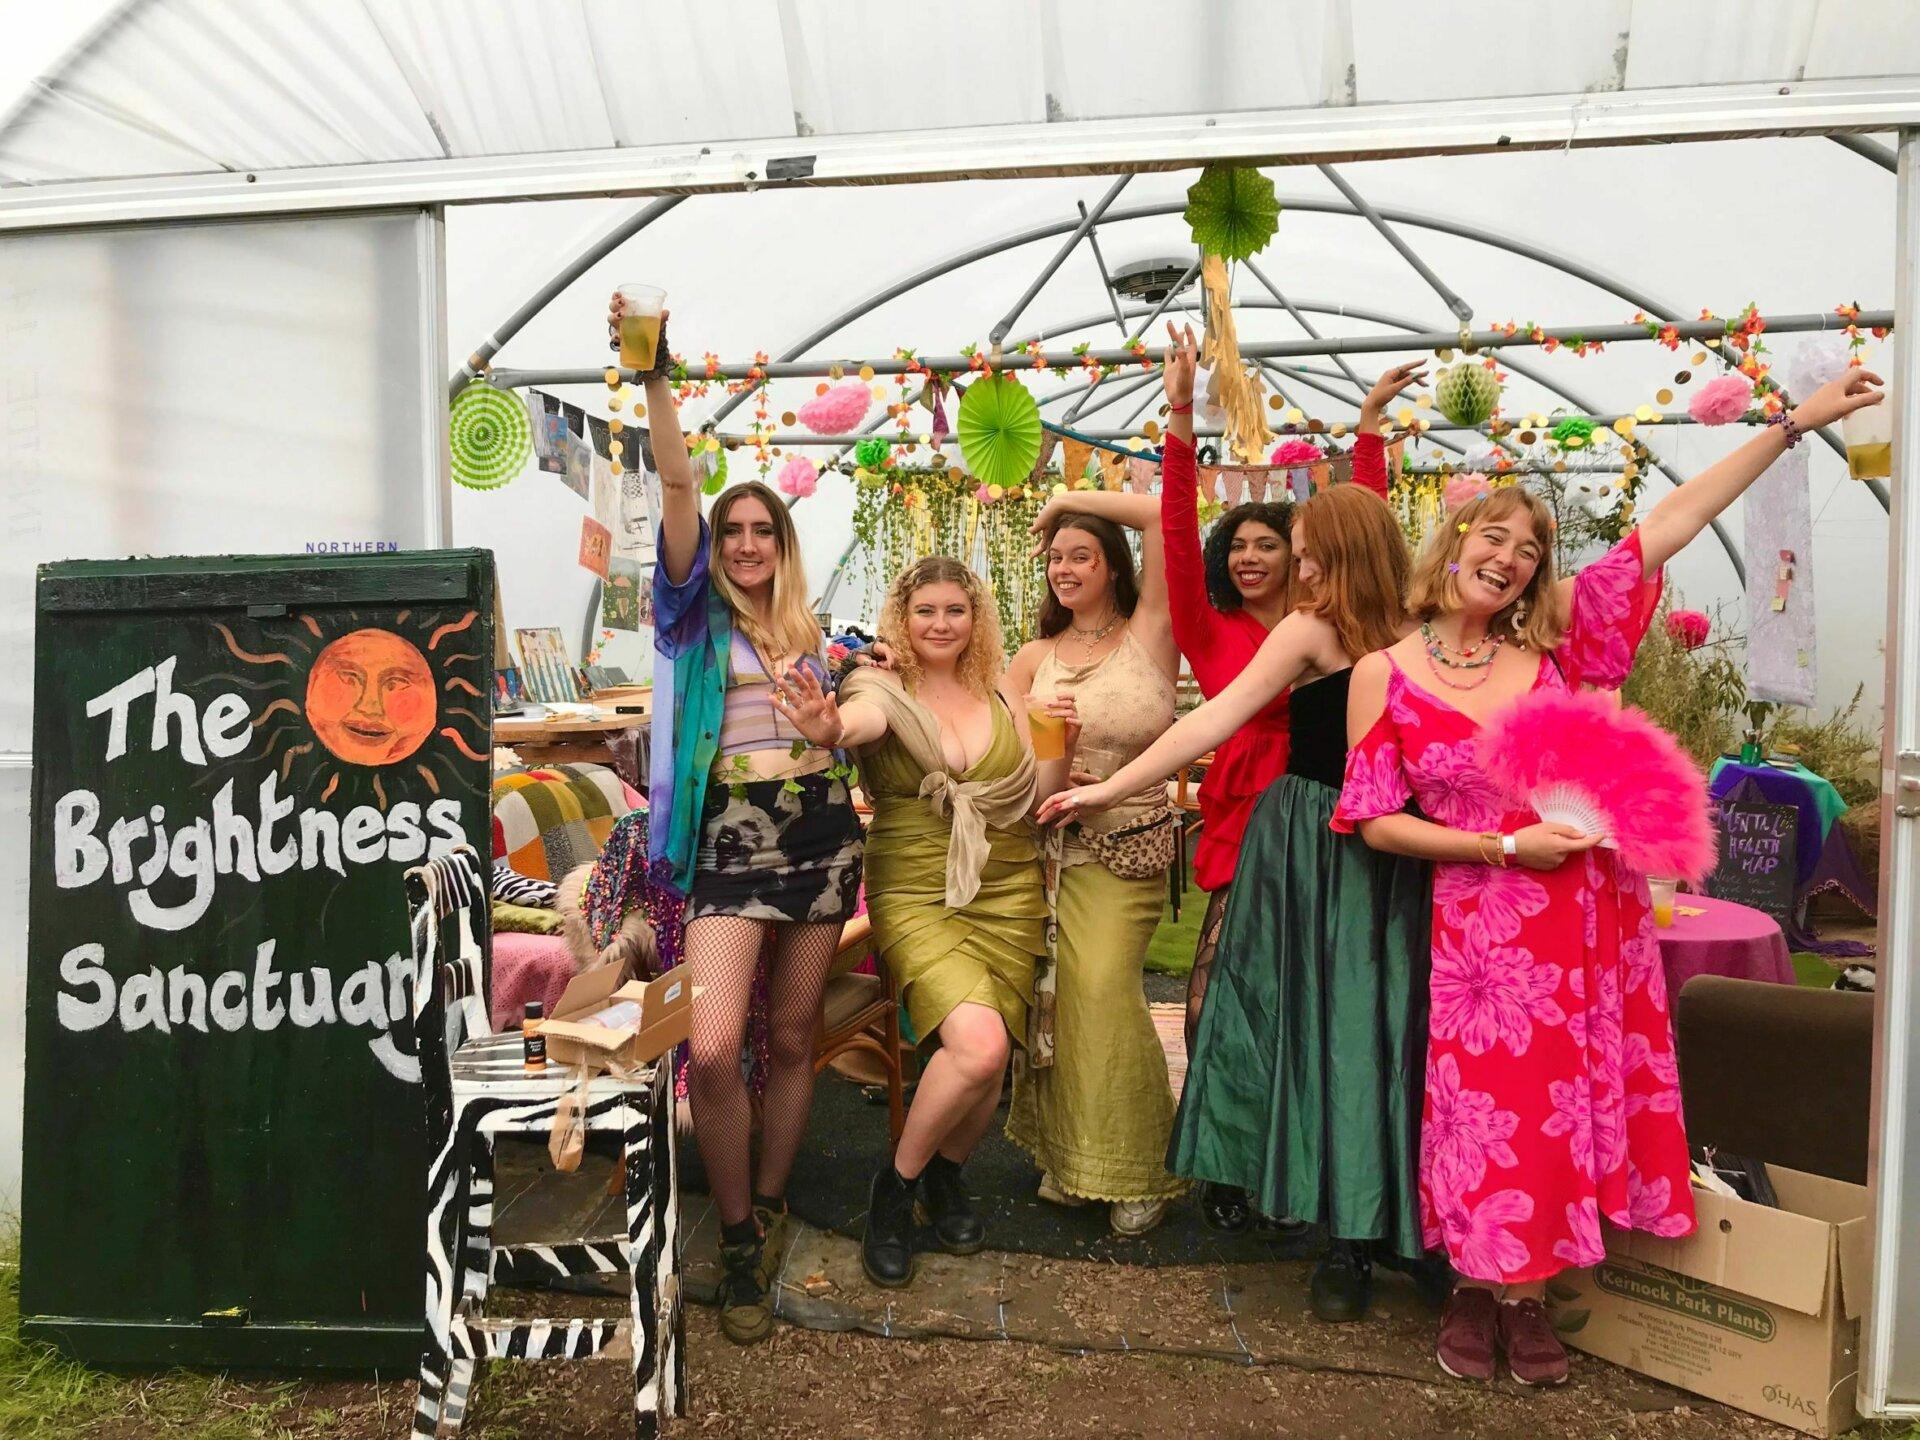 The So La Flair team in the Brightness Santuary at Green Island Festival